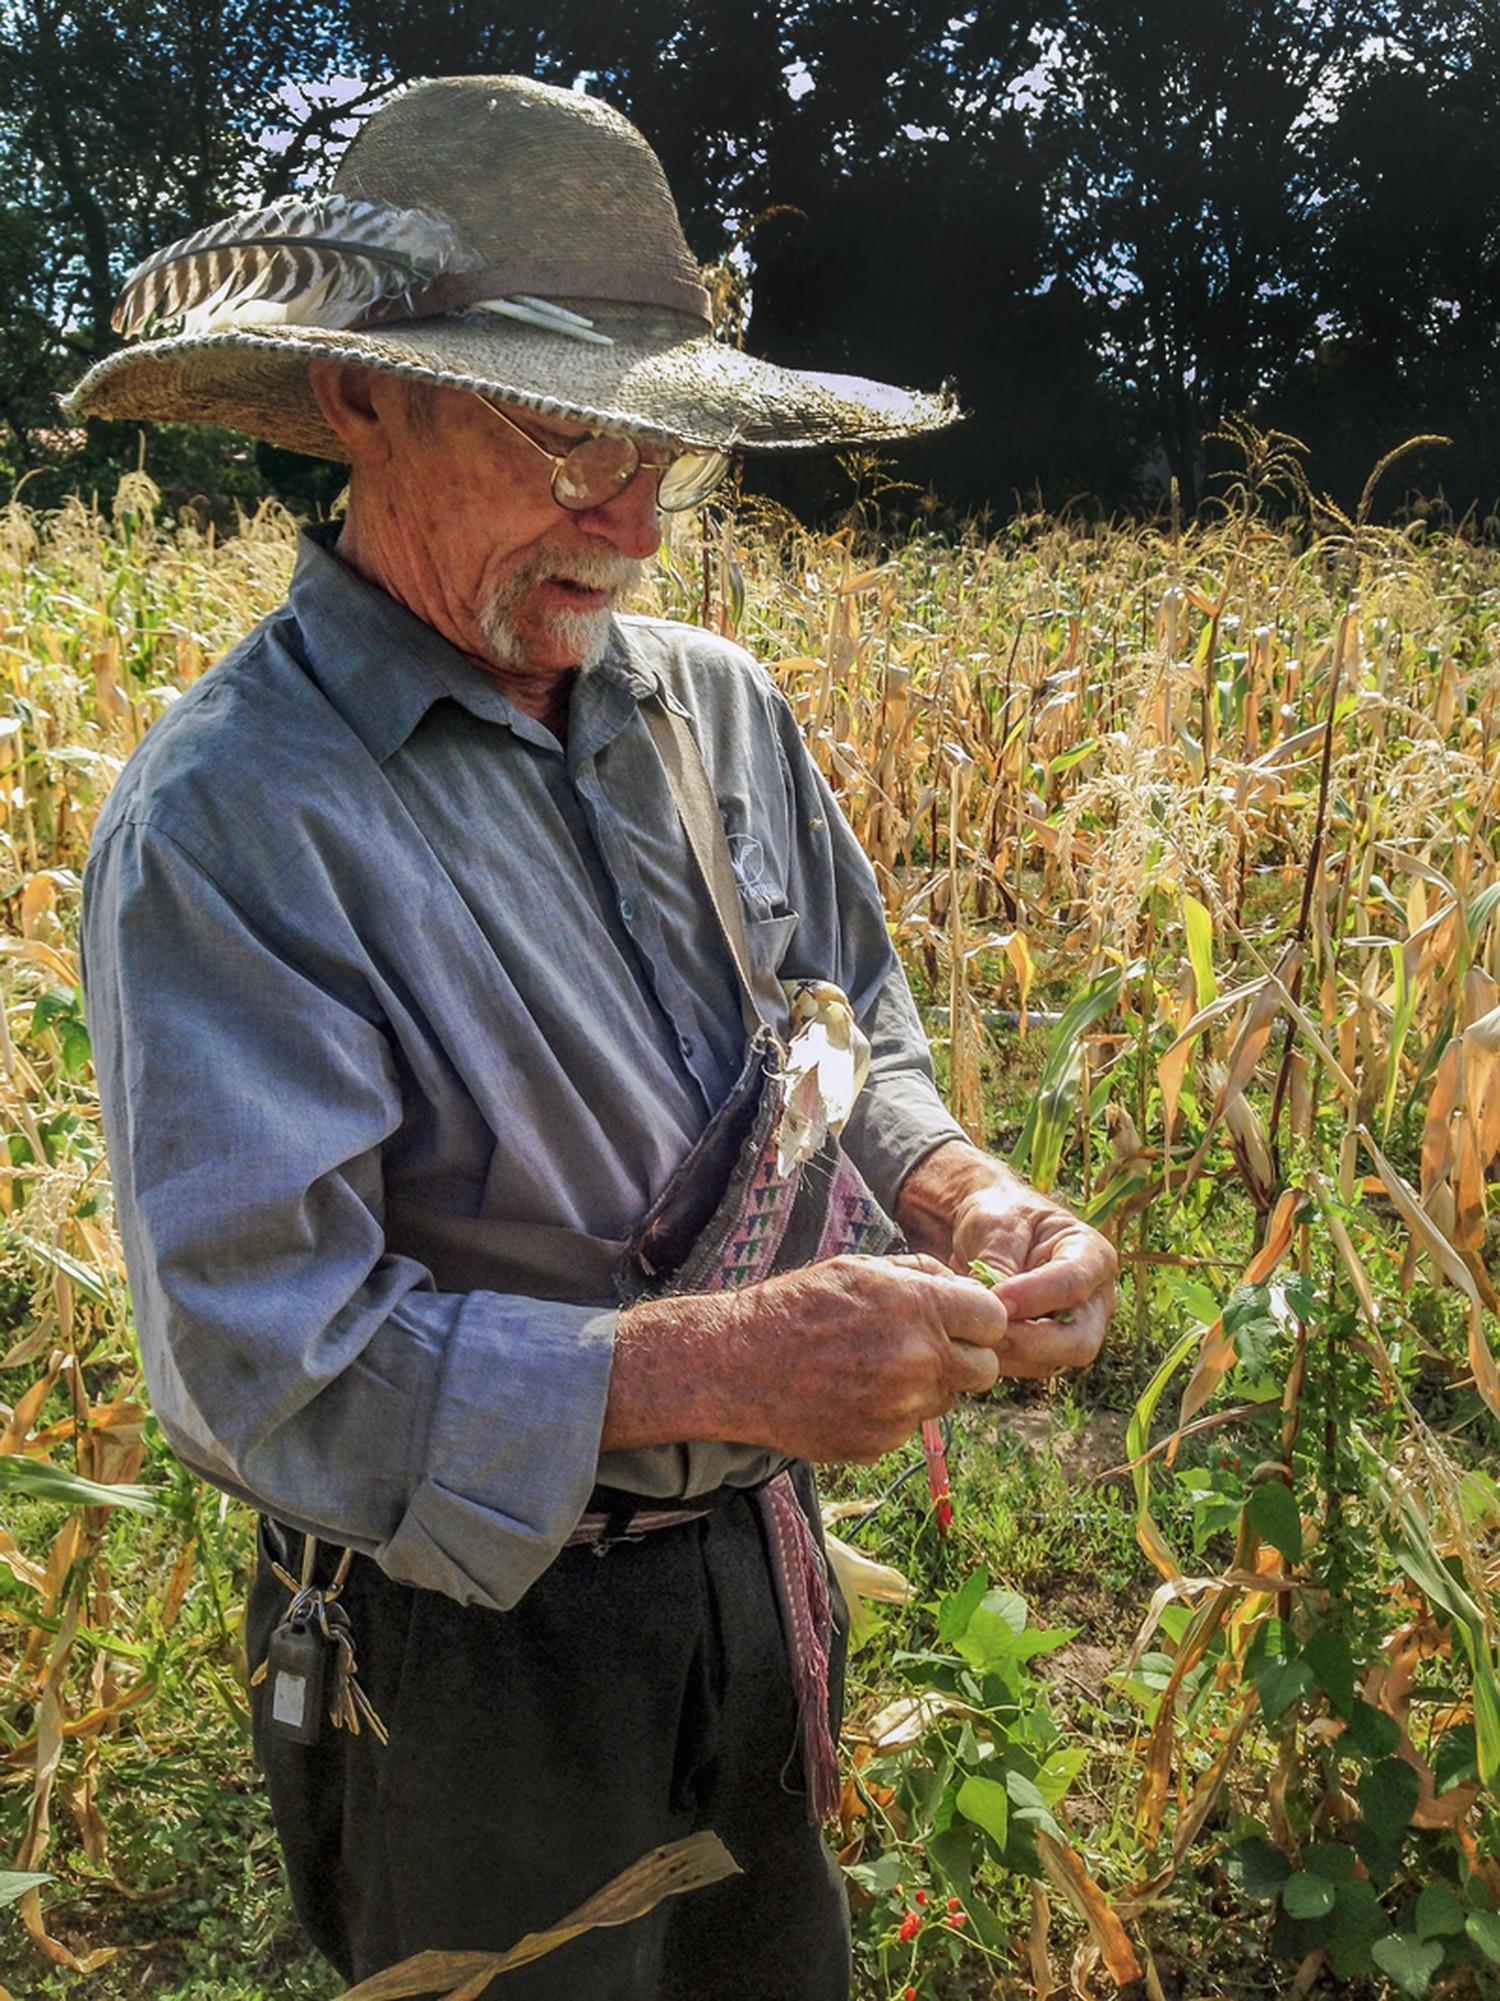 Mer-Girl Gardens farmer and Grain Team member Ron Boyd in his field.